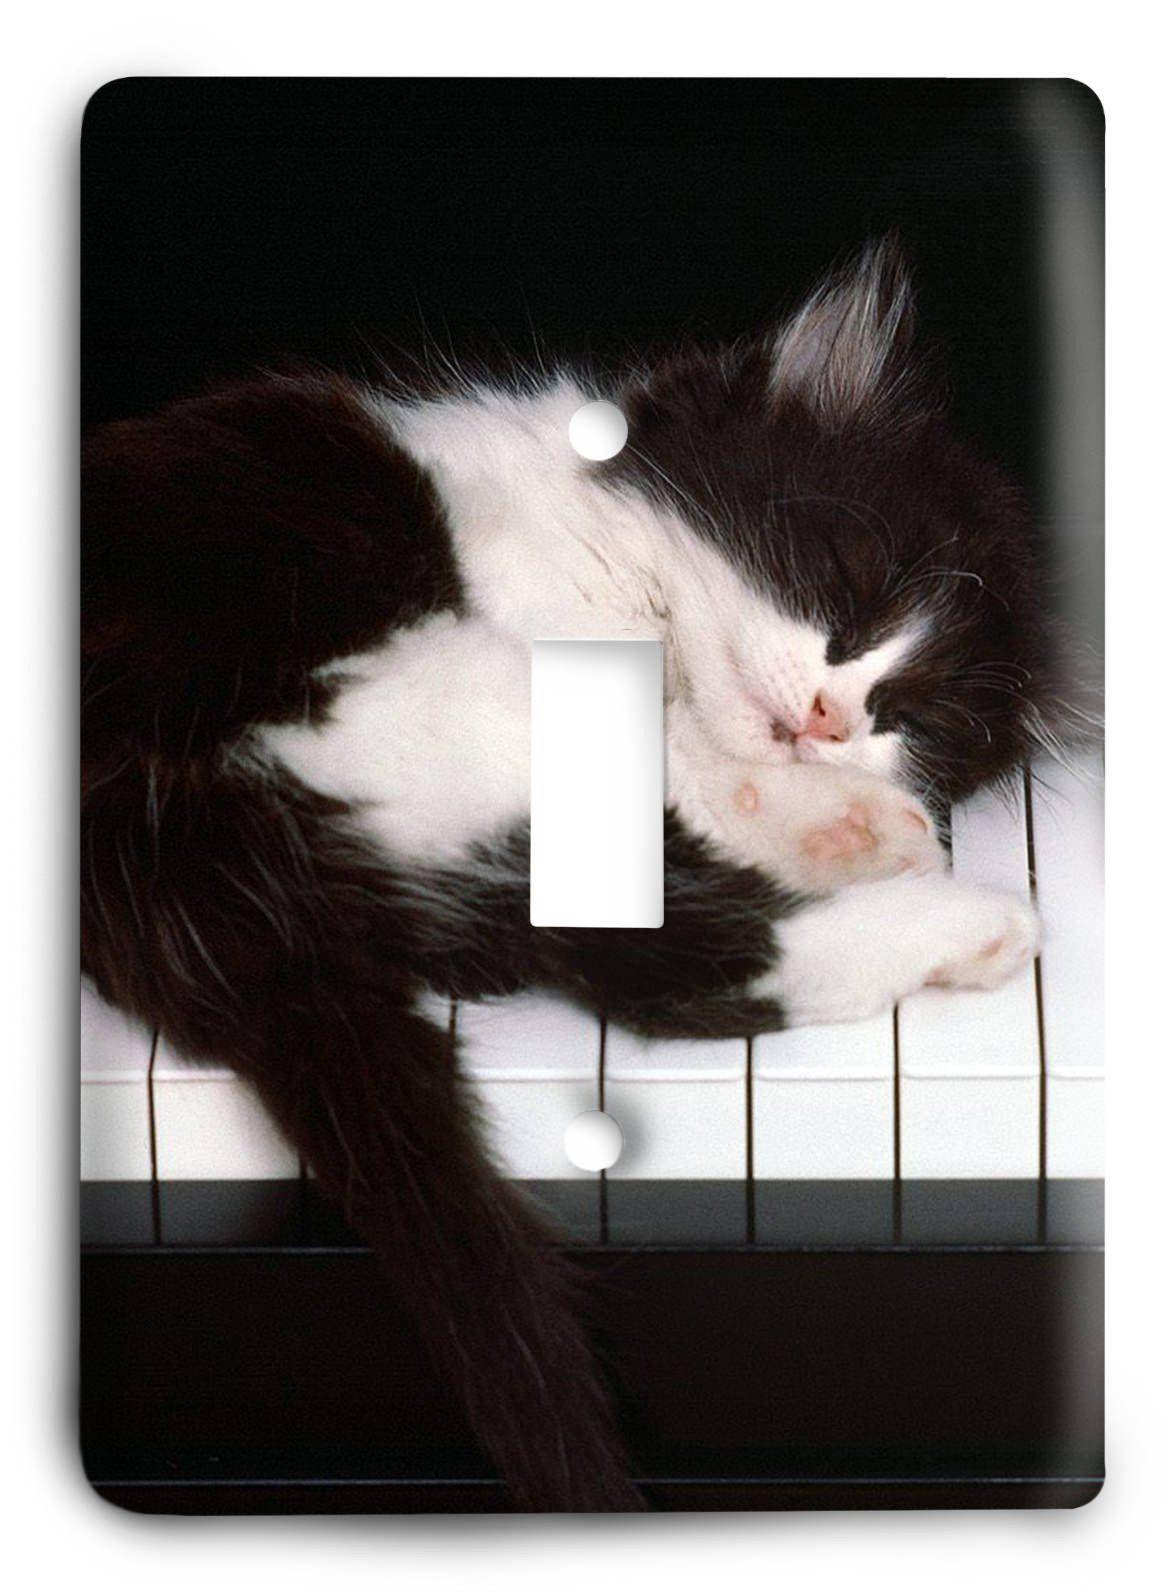 Ivory Piano Cat Love G5v69 Light Switch Cover Kittens Cutest Cat Sleeping Kittens